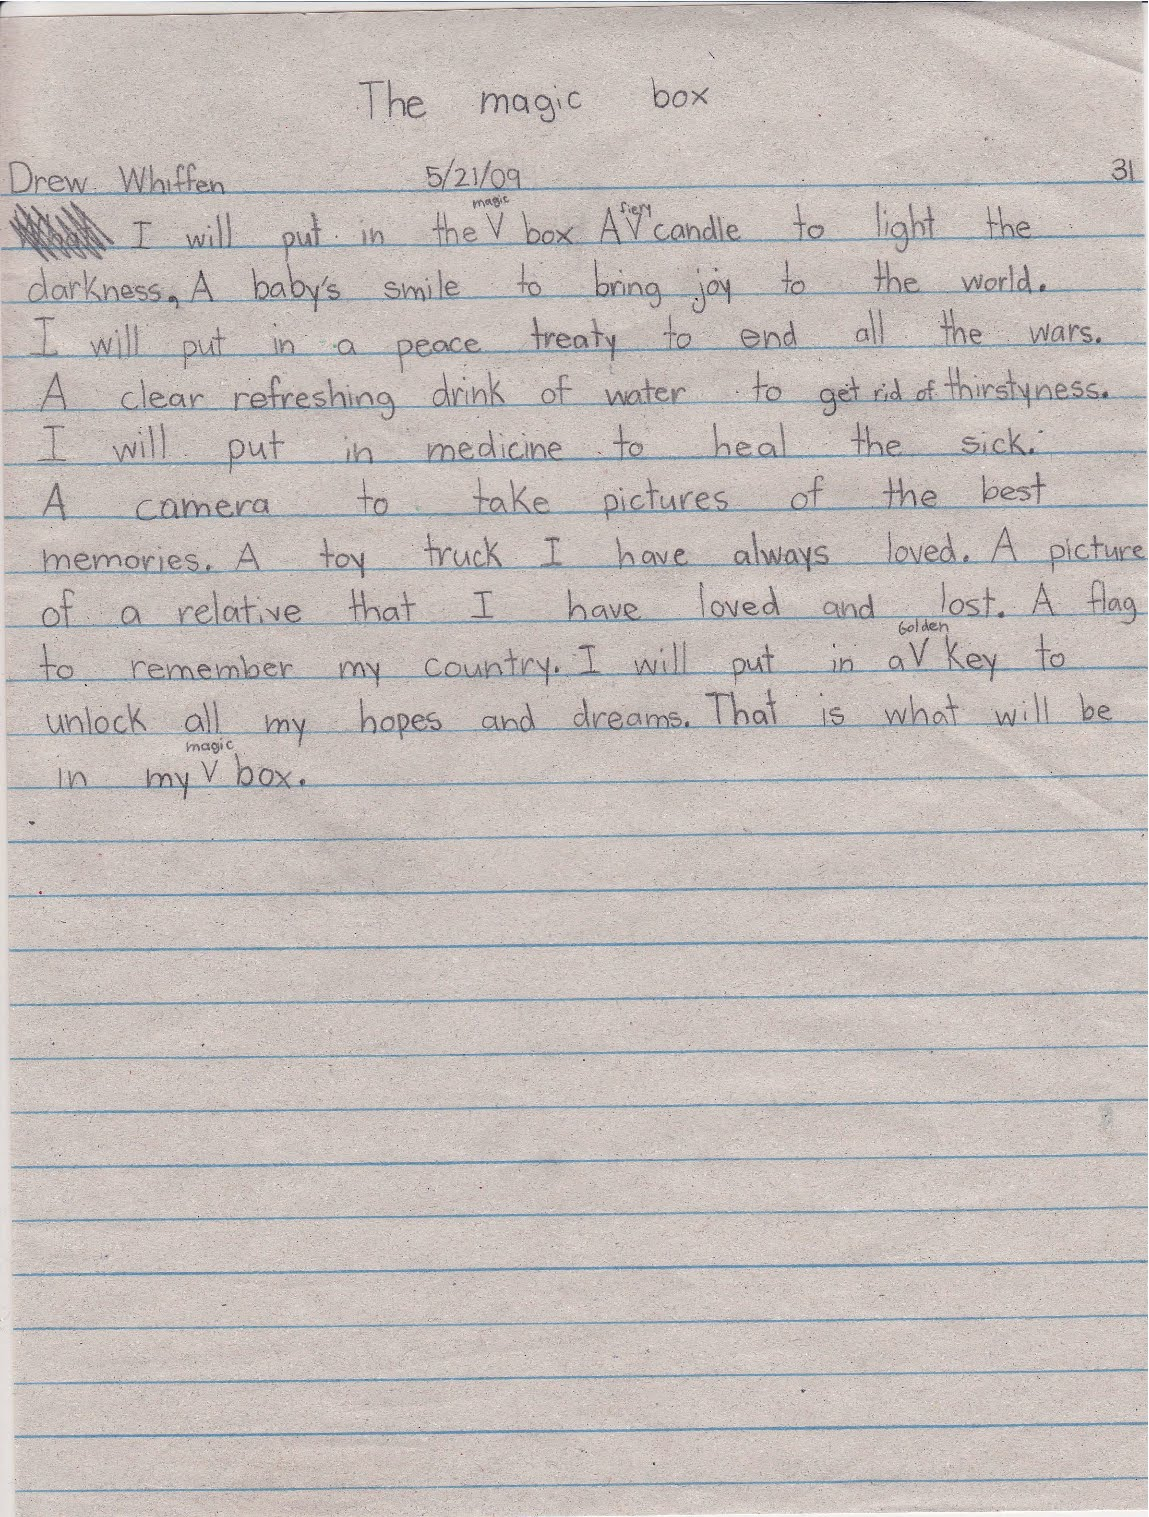 Discursive essay prompts